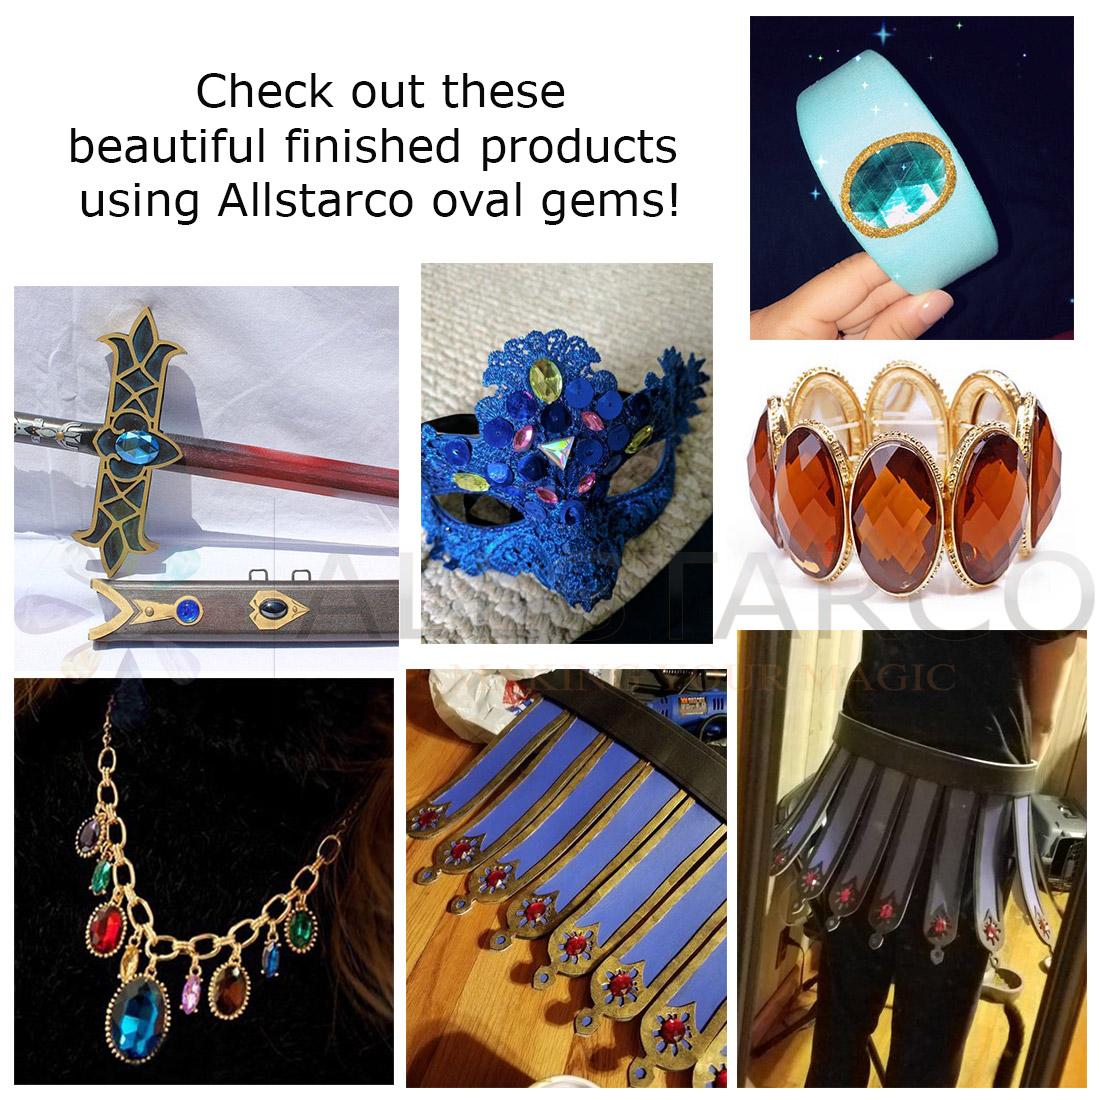 allstarco rhinestones diy projects crafts